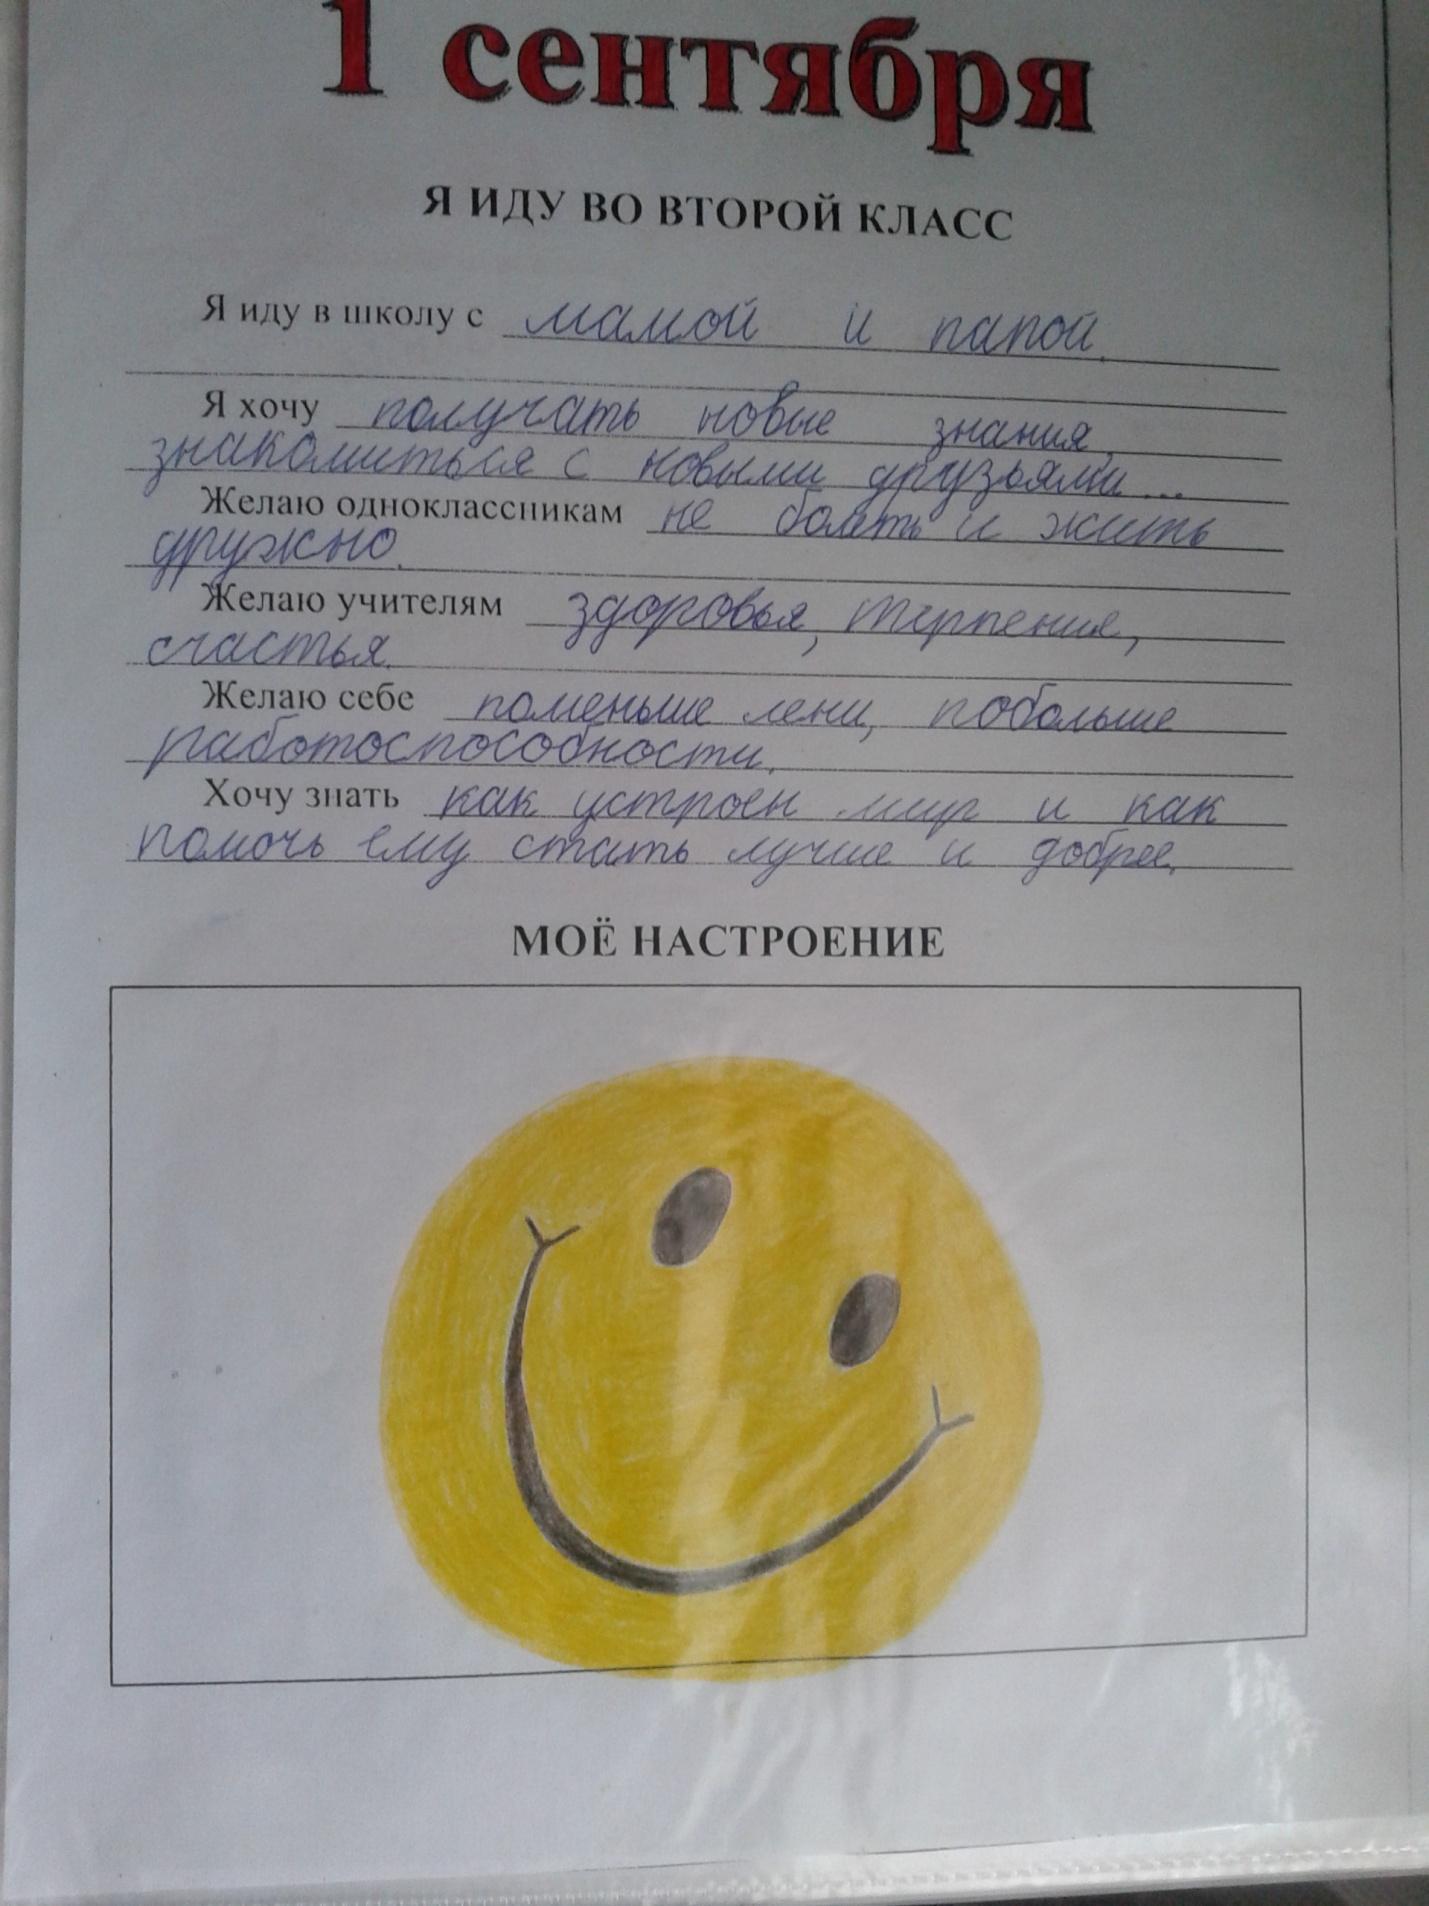 C:\Users\Vladimir\Pictures\2016-01-21 долматов портфолио\долматов портфолио 056.jpg